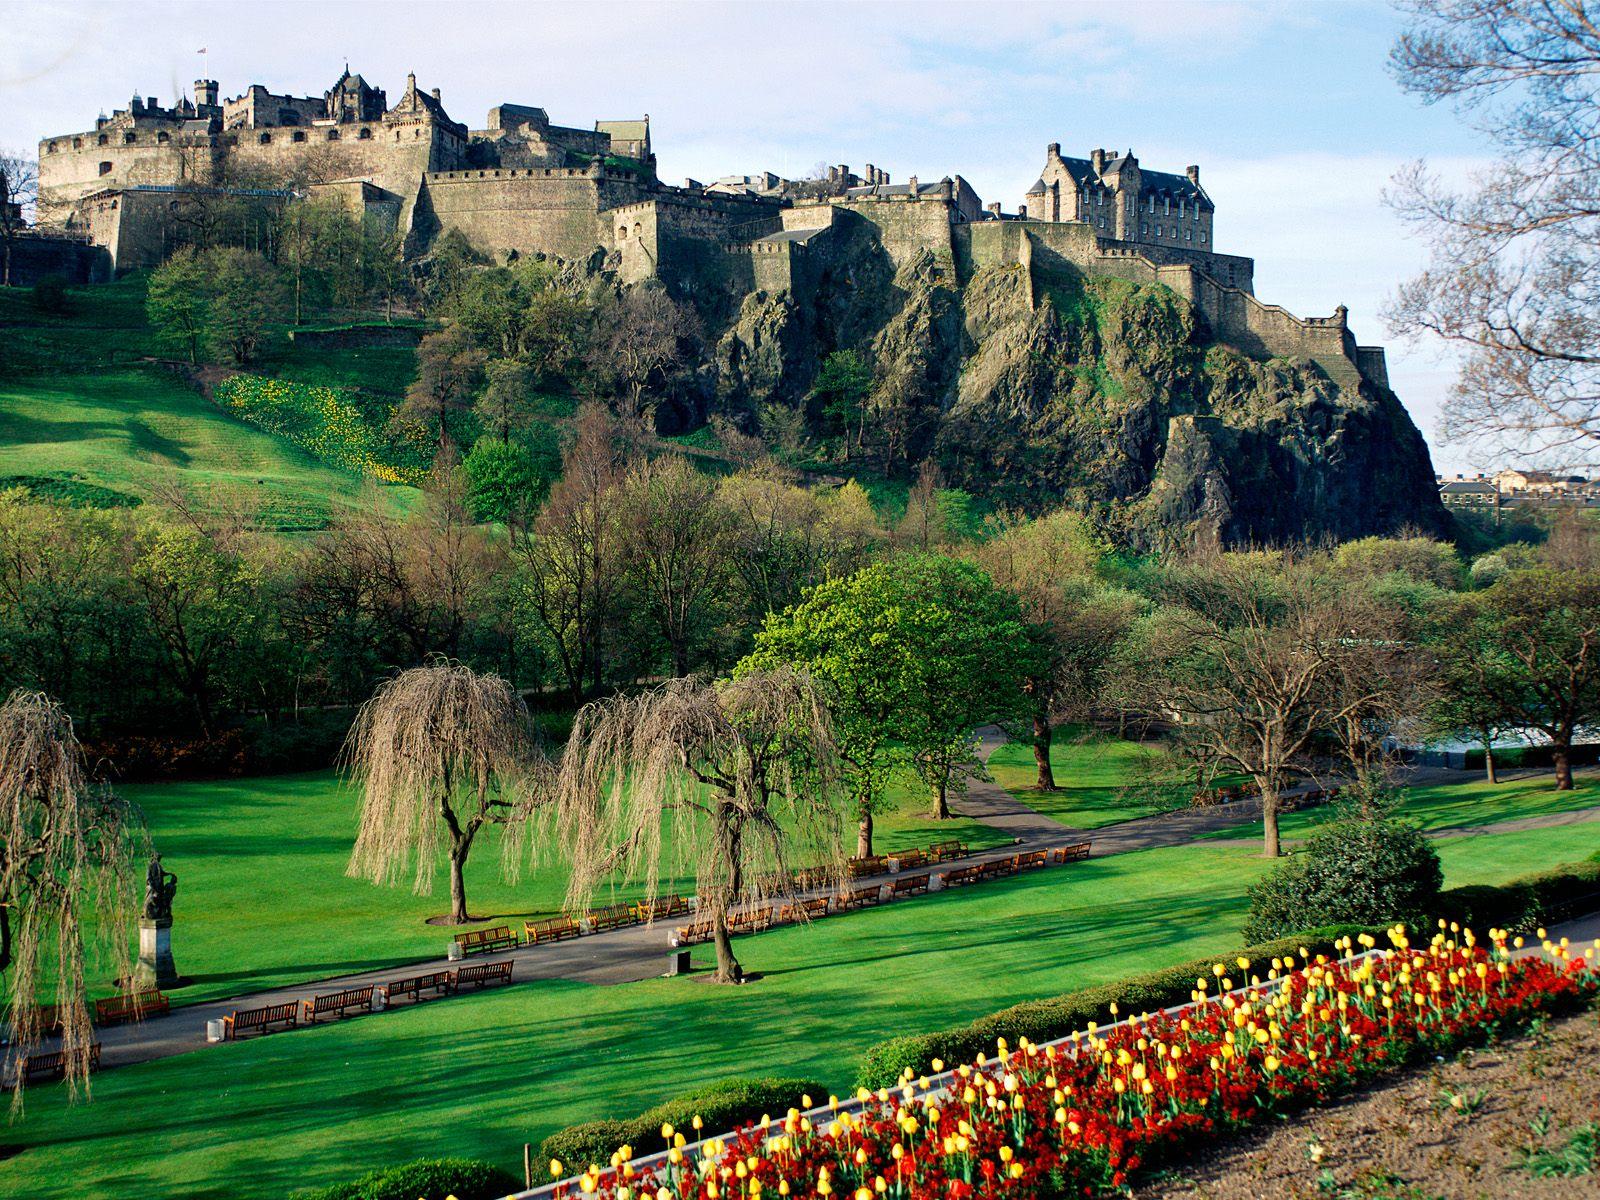 edinburgh castle edinburgh scotland.jpg